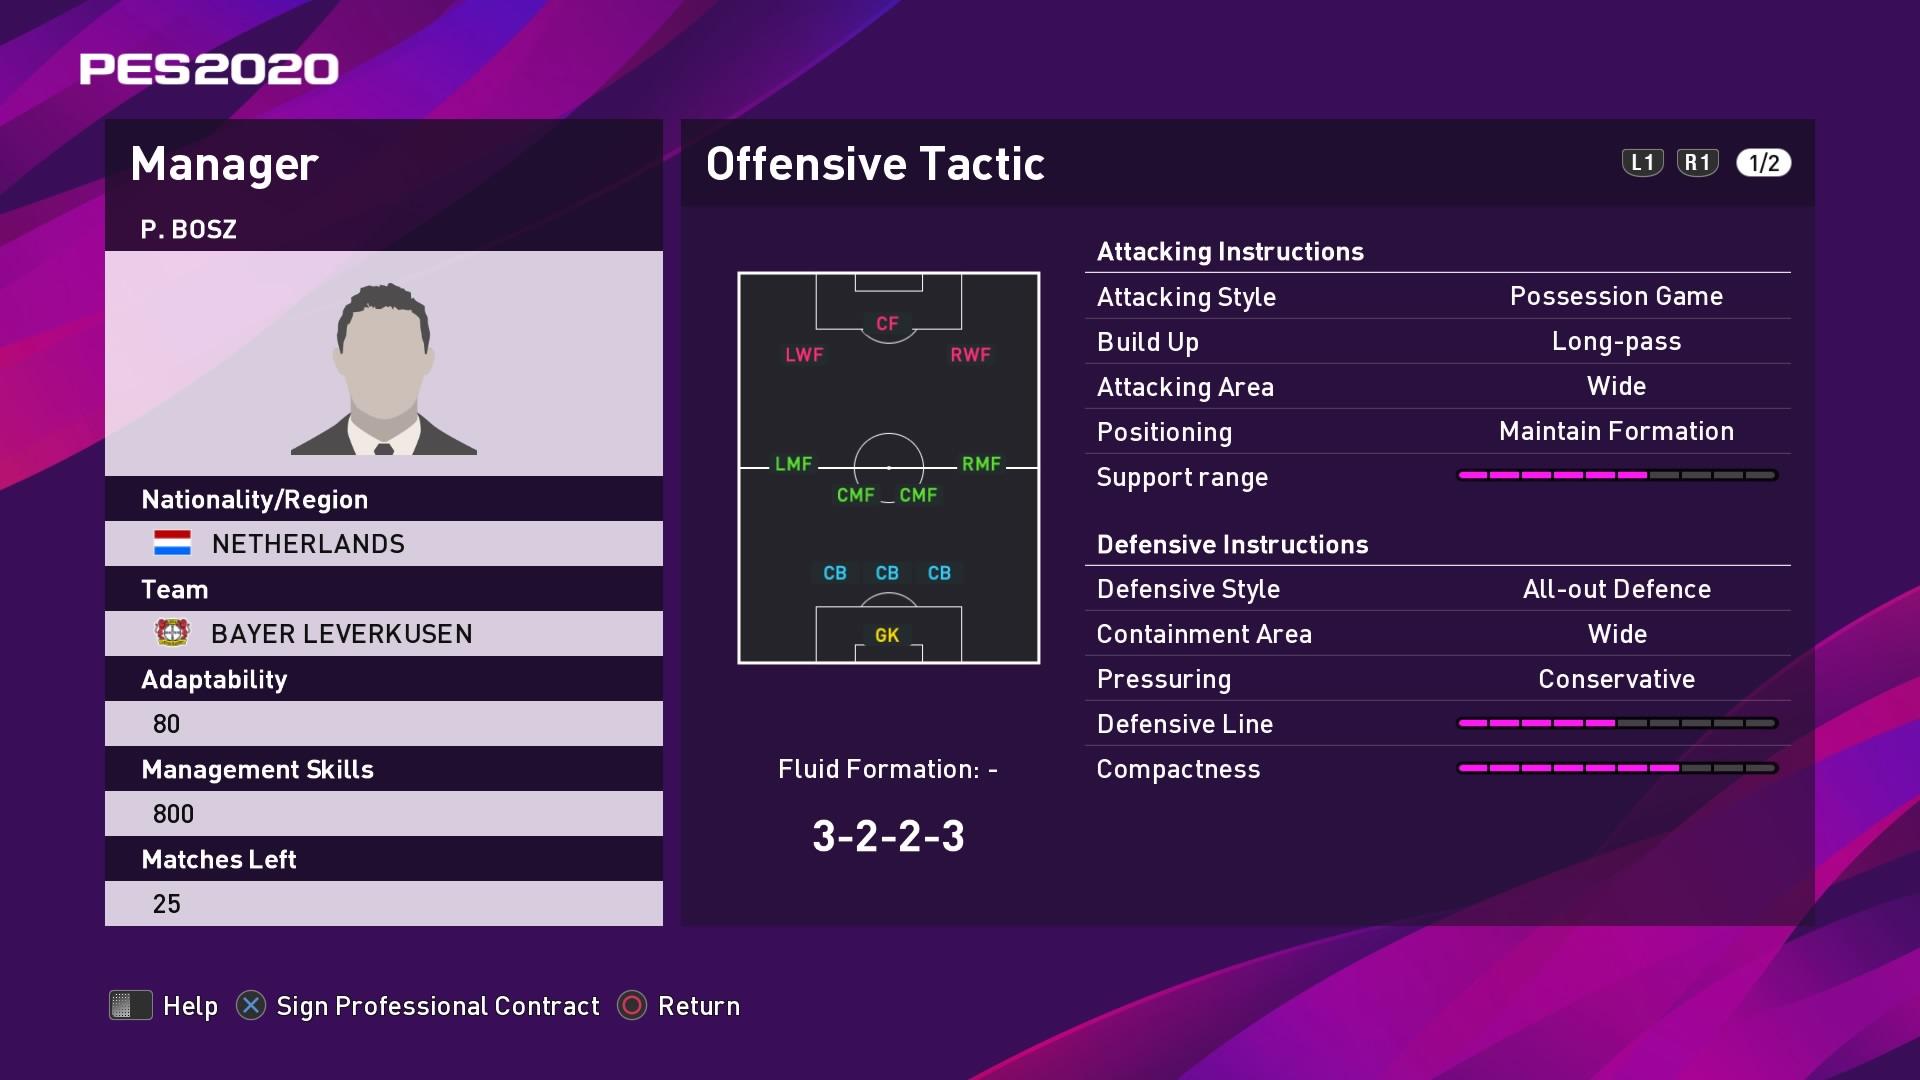 P. Bosz (Peter Bosz) Offensive Tactic in PES 2020 myClub